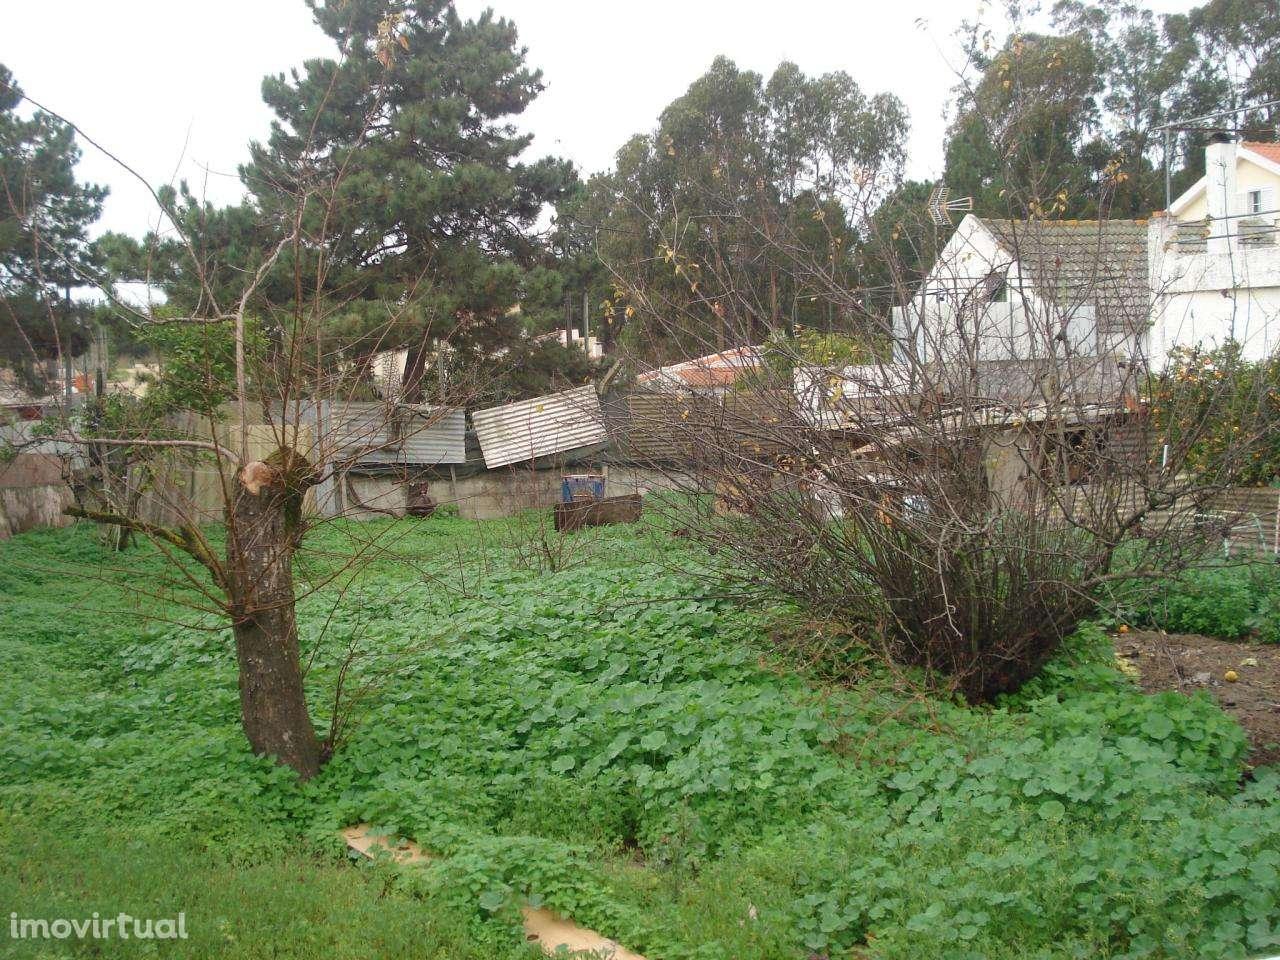 Terreno para comprar, Quinta do Conde, Sesimbra, Setúbal - Foto 3